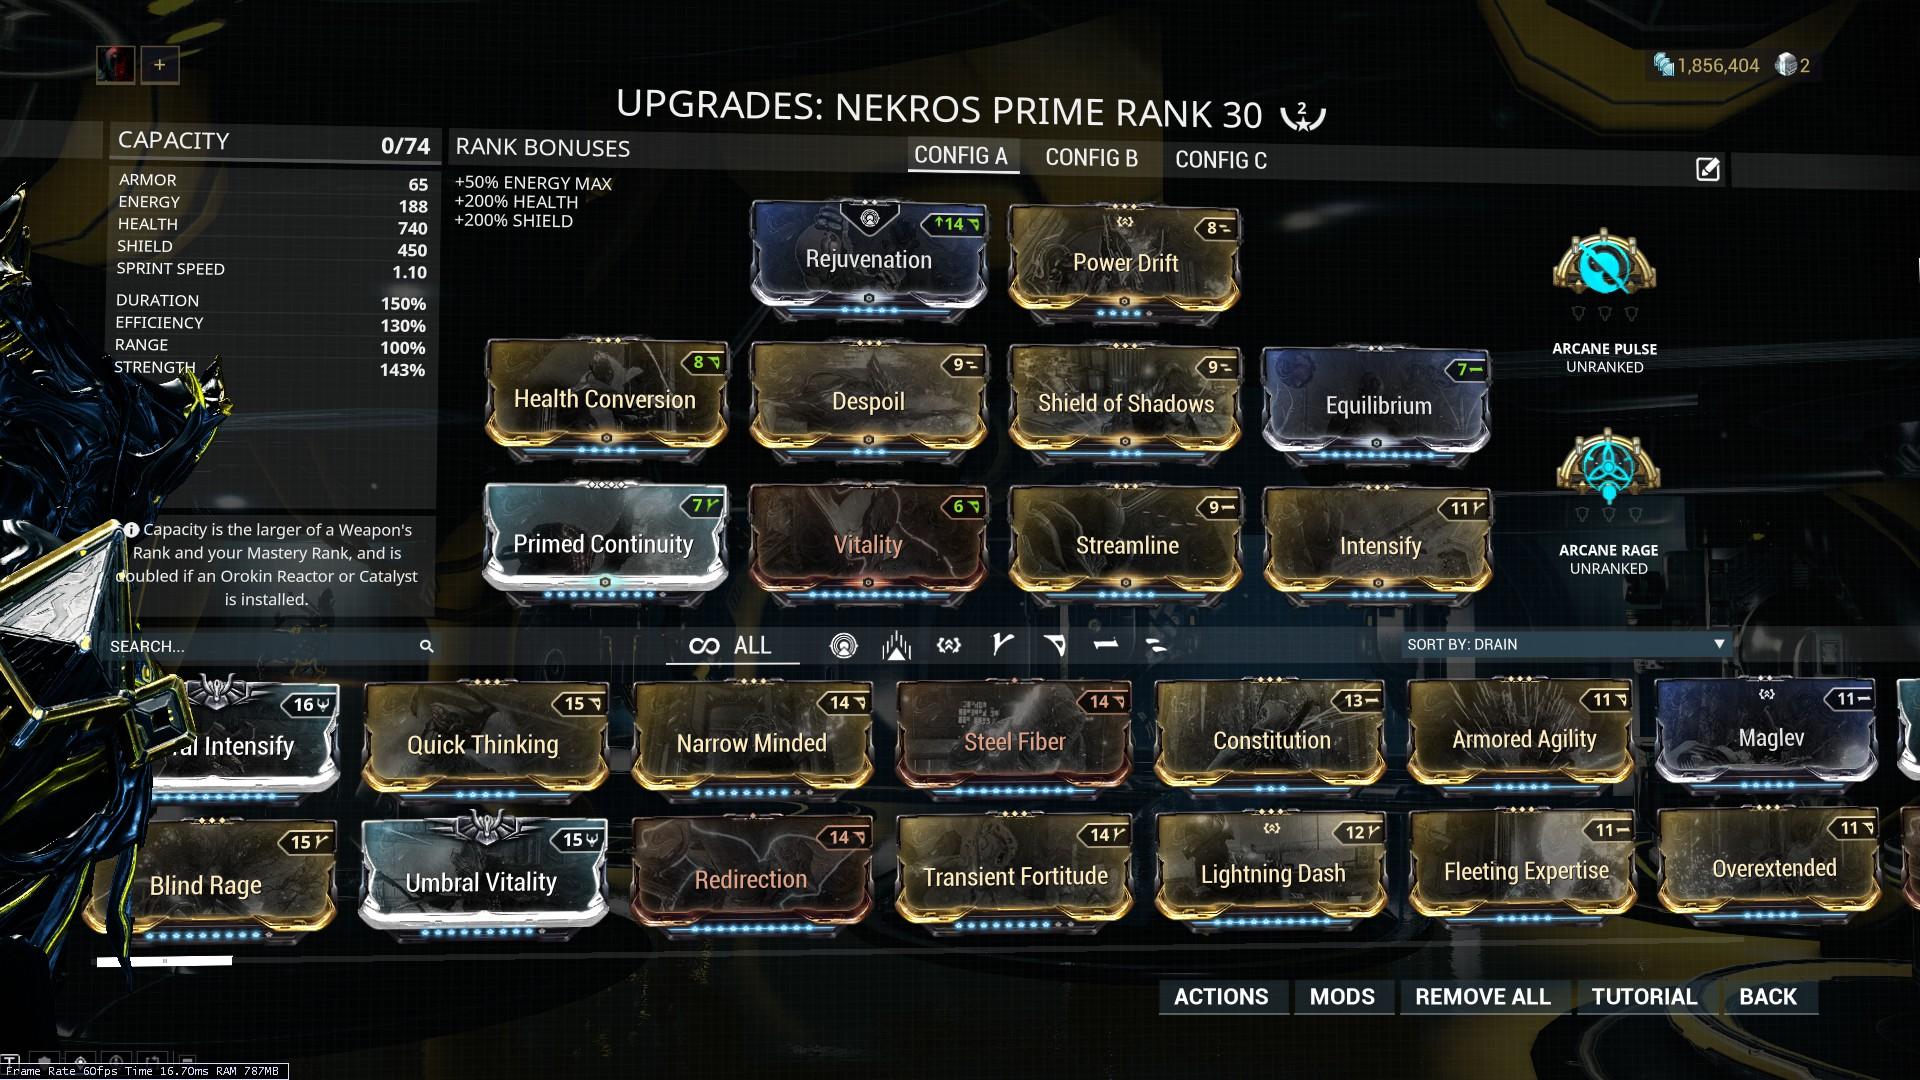 Best Tank Warframe 2019 A tanky Nekros build to farm (mod combos build)   General